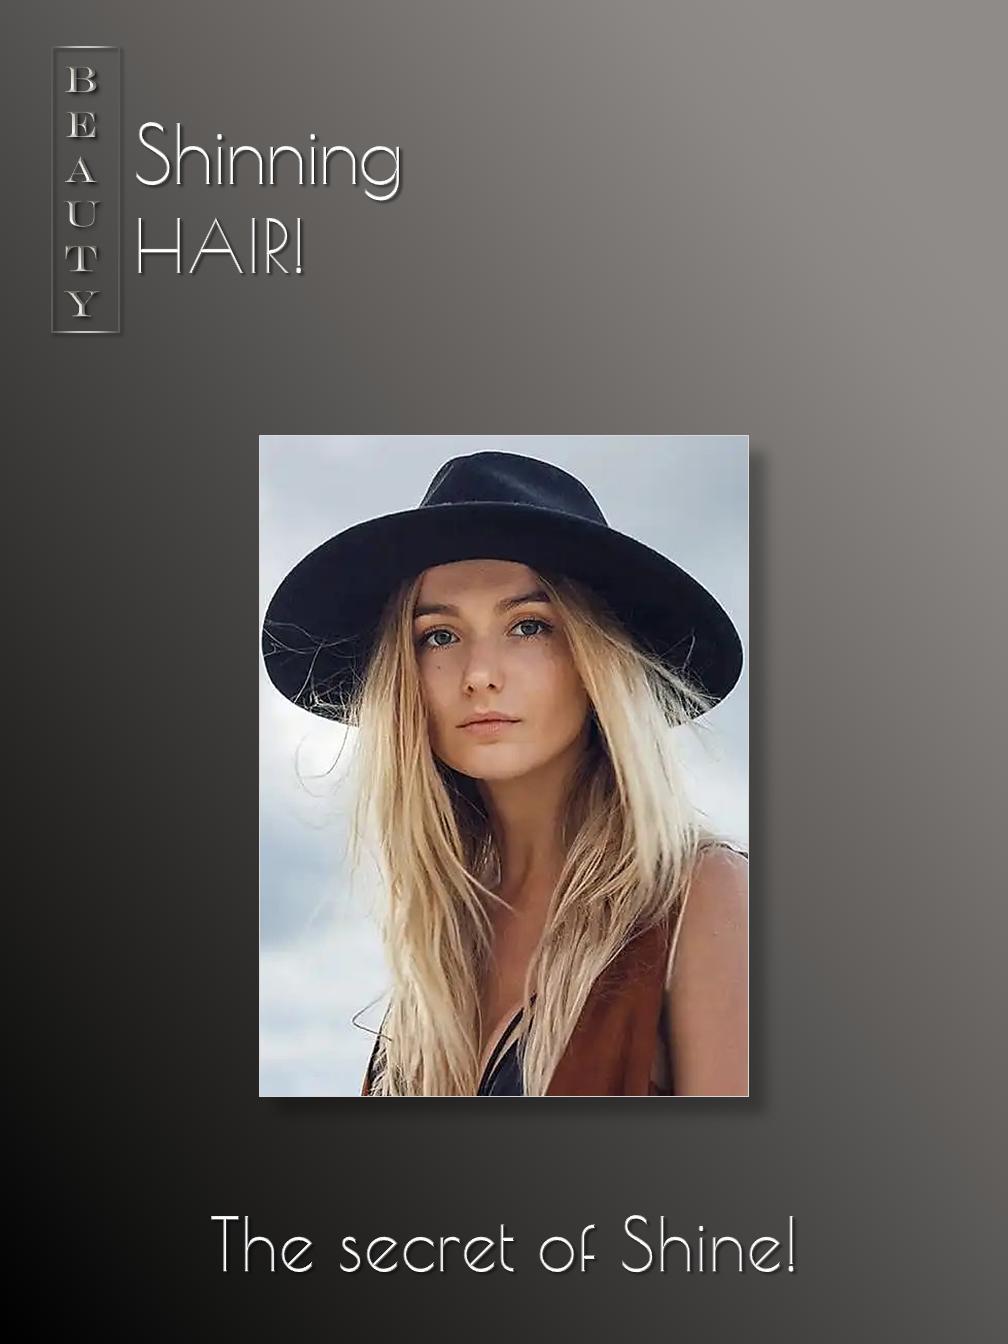 Shinning Hair